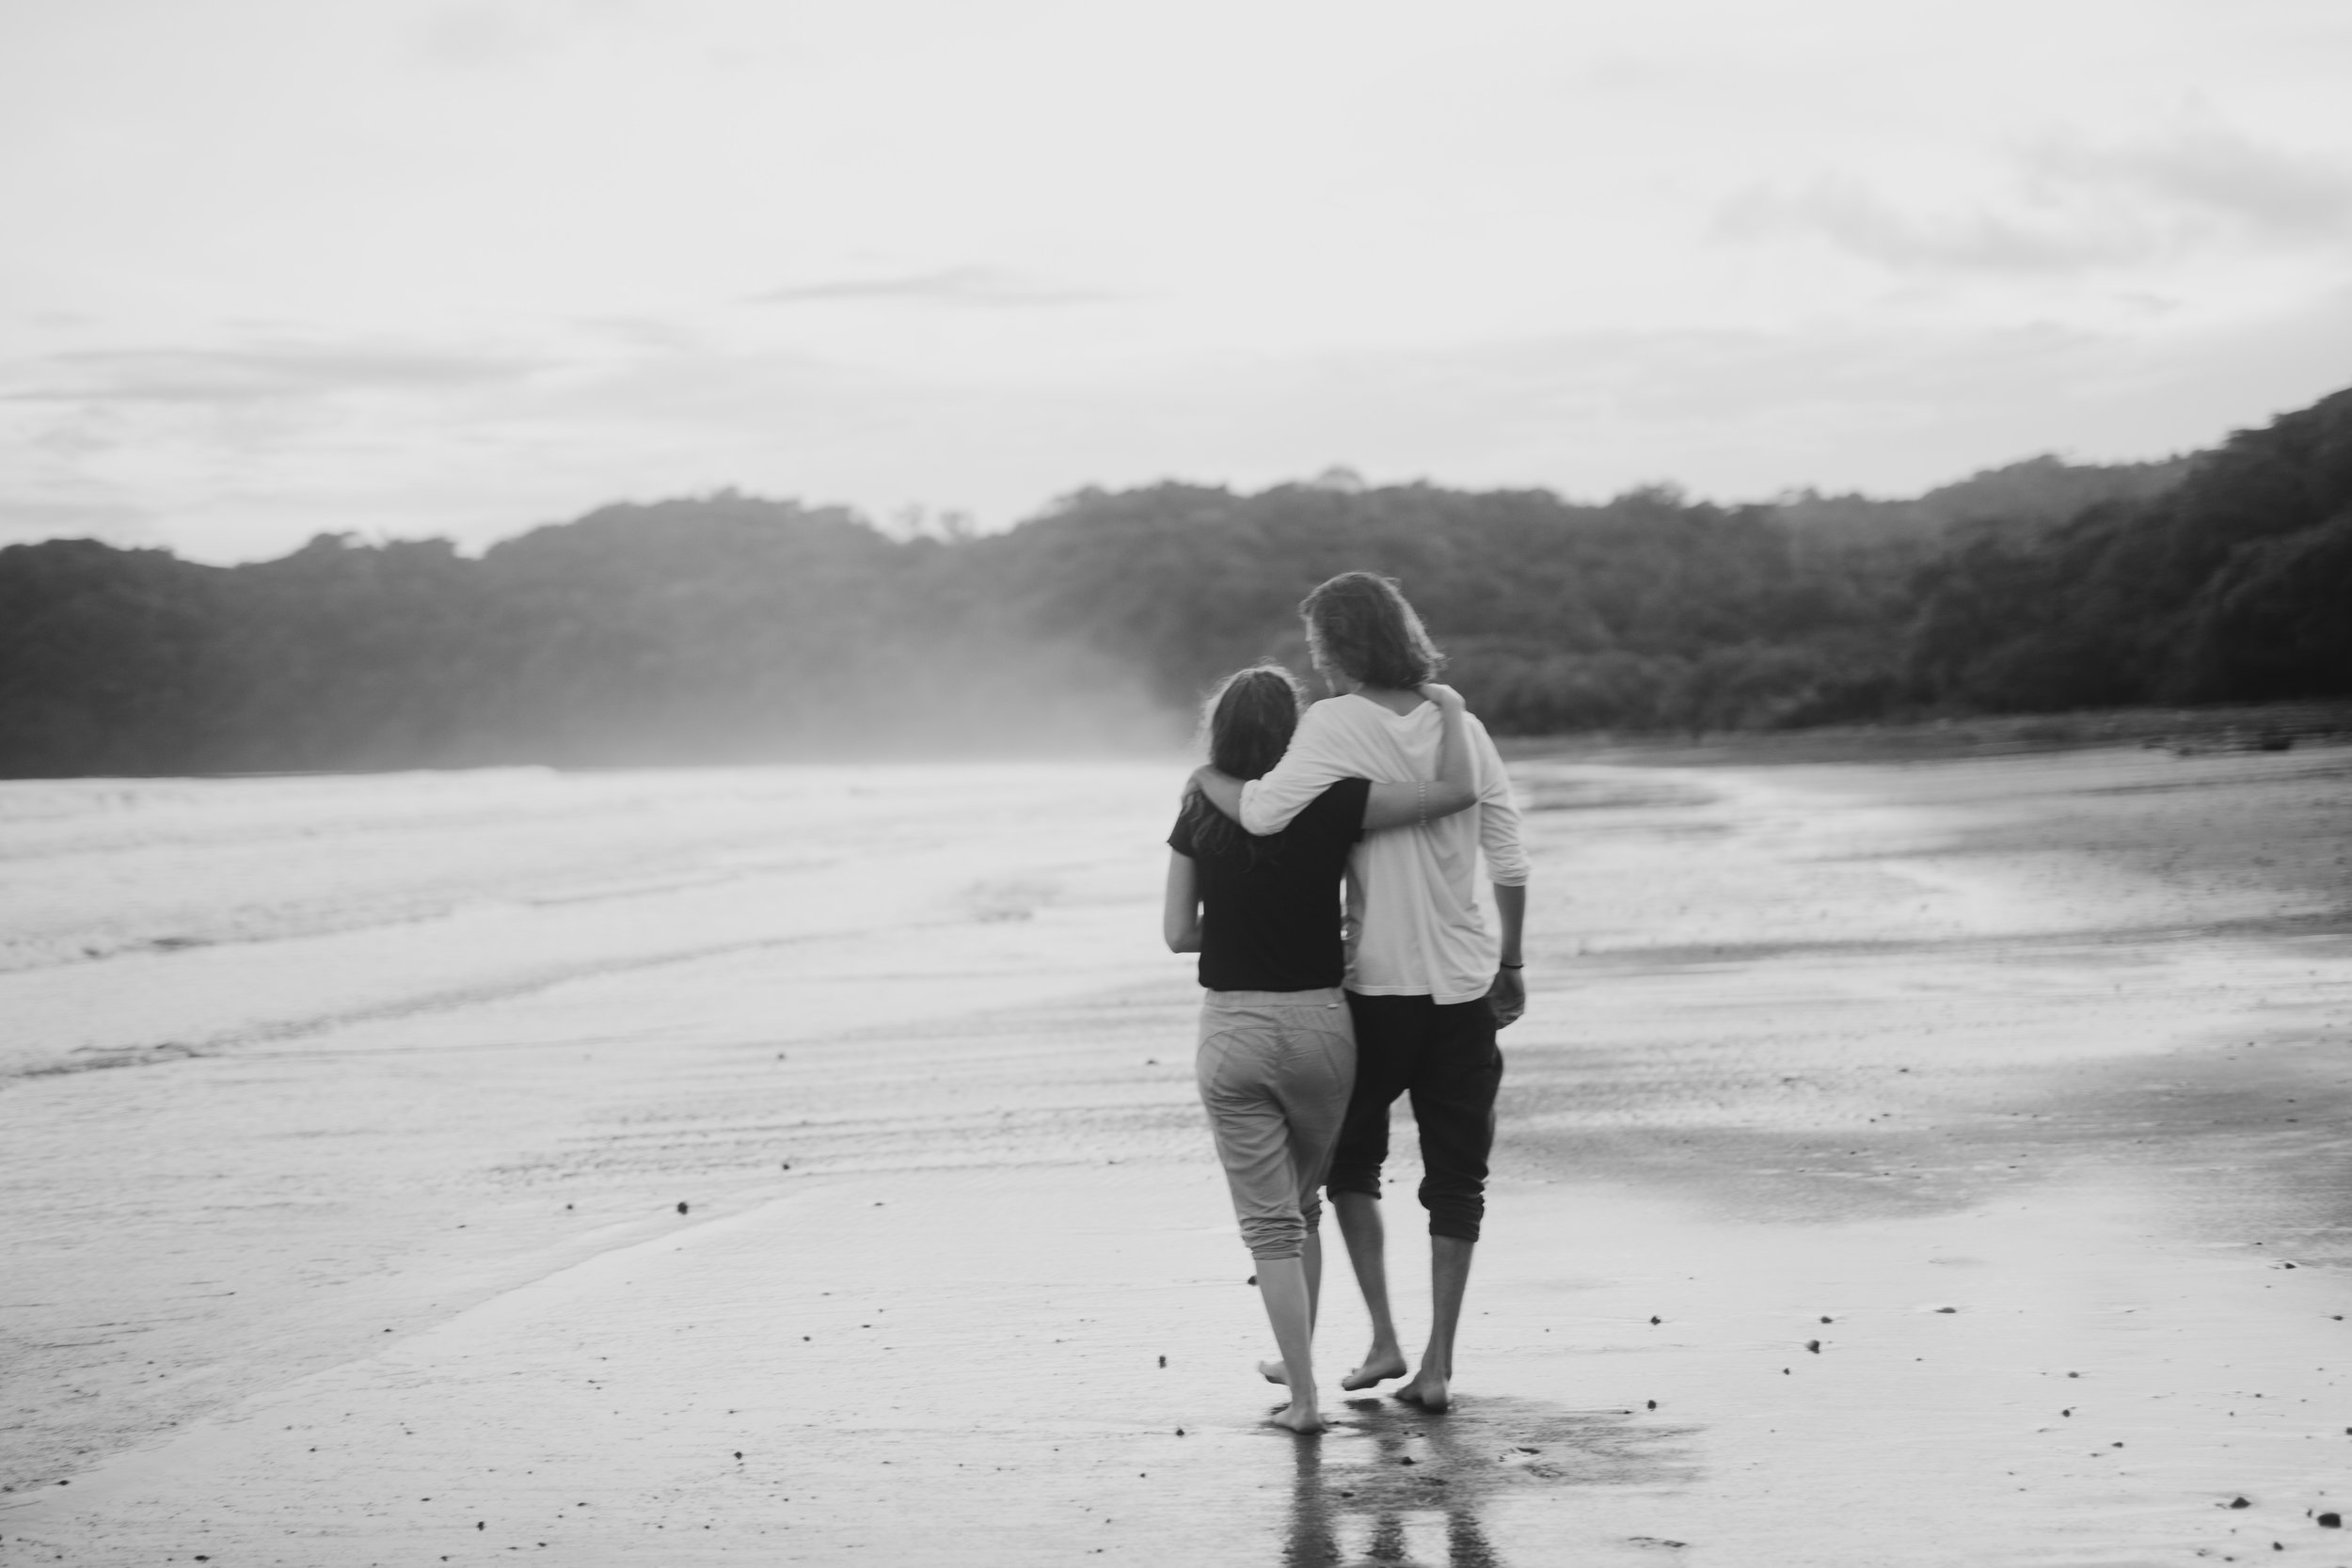 Panama Beach Engagement_Polly C Photography_20171707183326.jpg